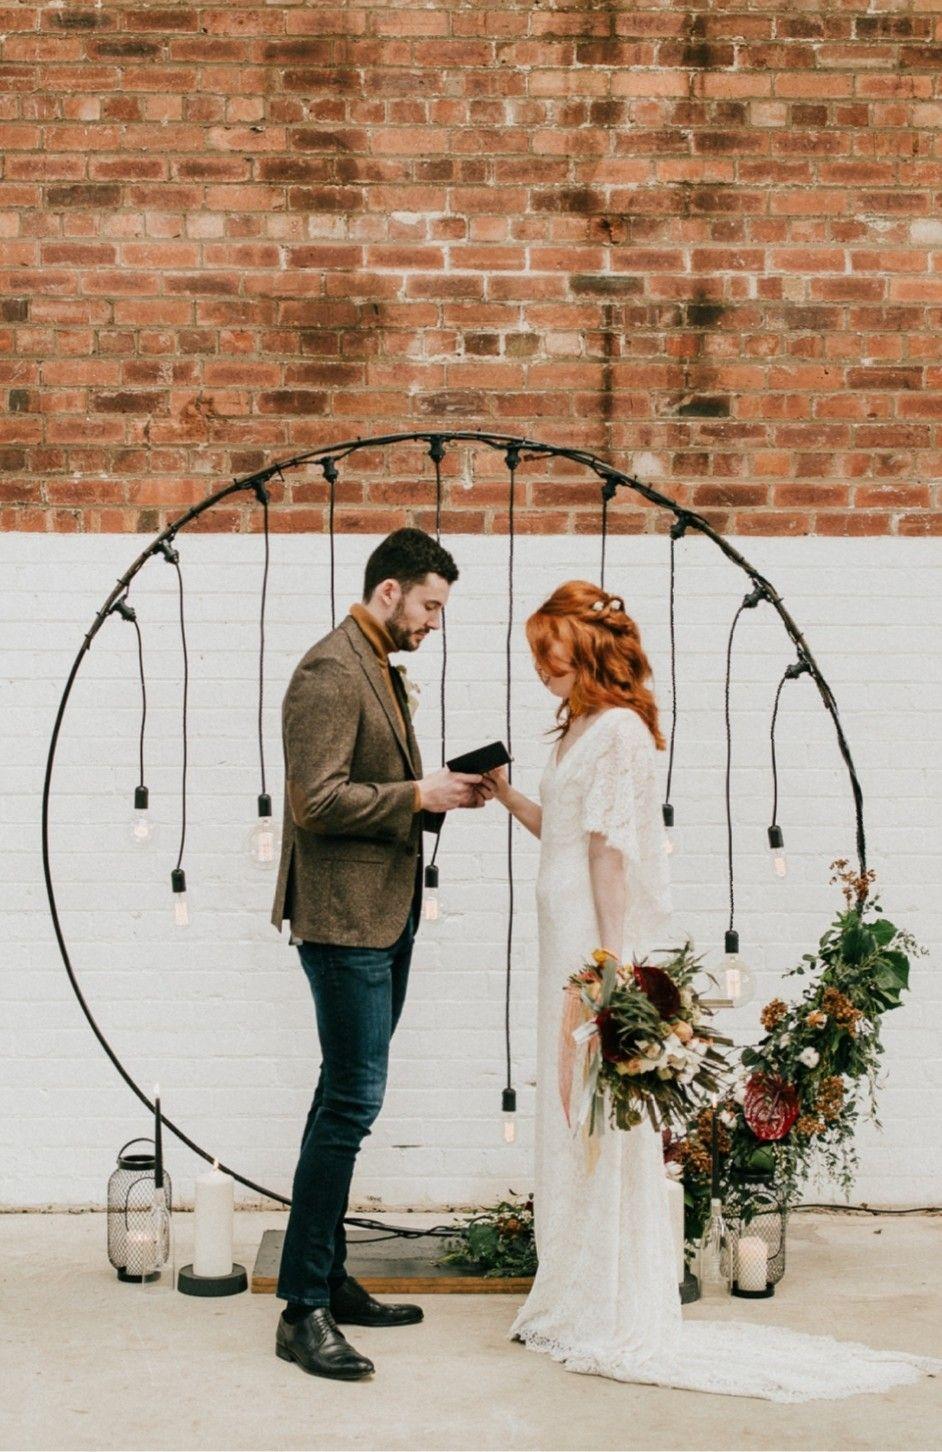 Earthy Tone Industrial Wedding At 92 Burton Road In Sheffield Edison Bulb Moongate Backdrop Wedding Industrial Wedding Edison Bulb Wedding Boho Flower Girl